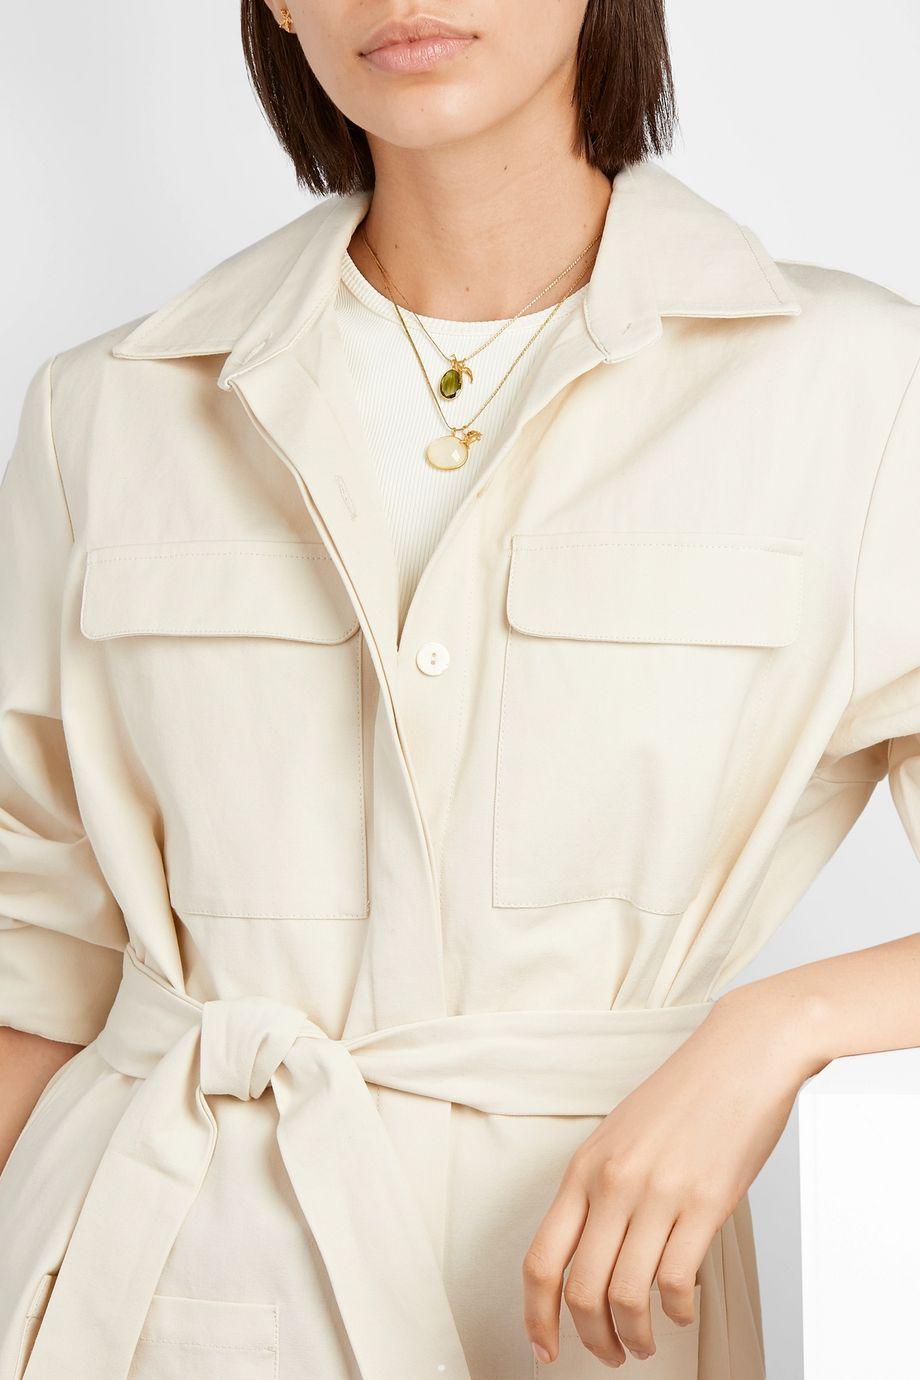 Pippa Small 18-karat gold moonstone necklace